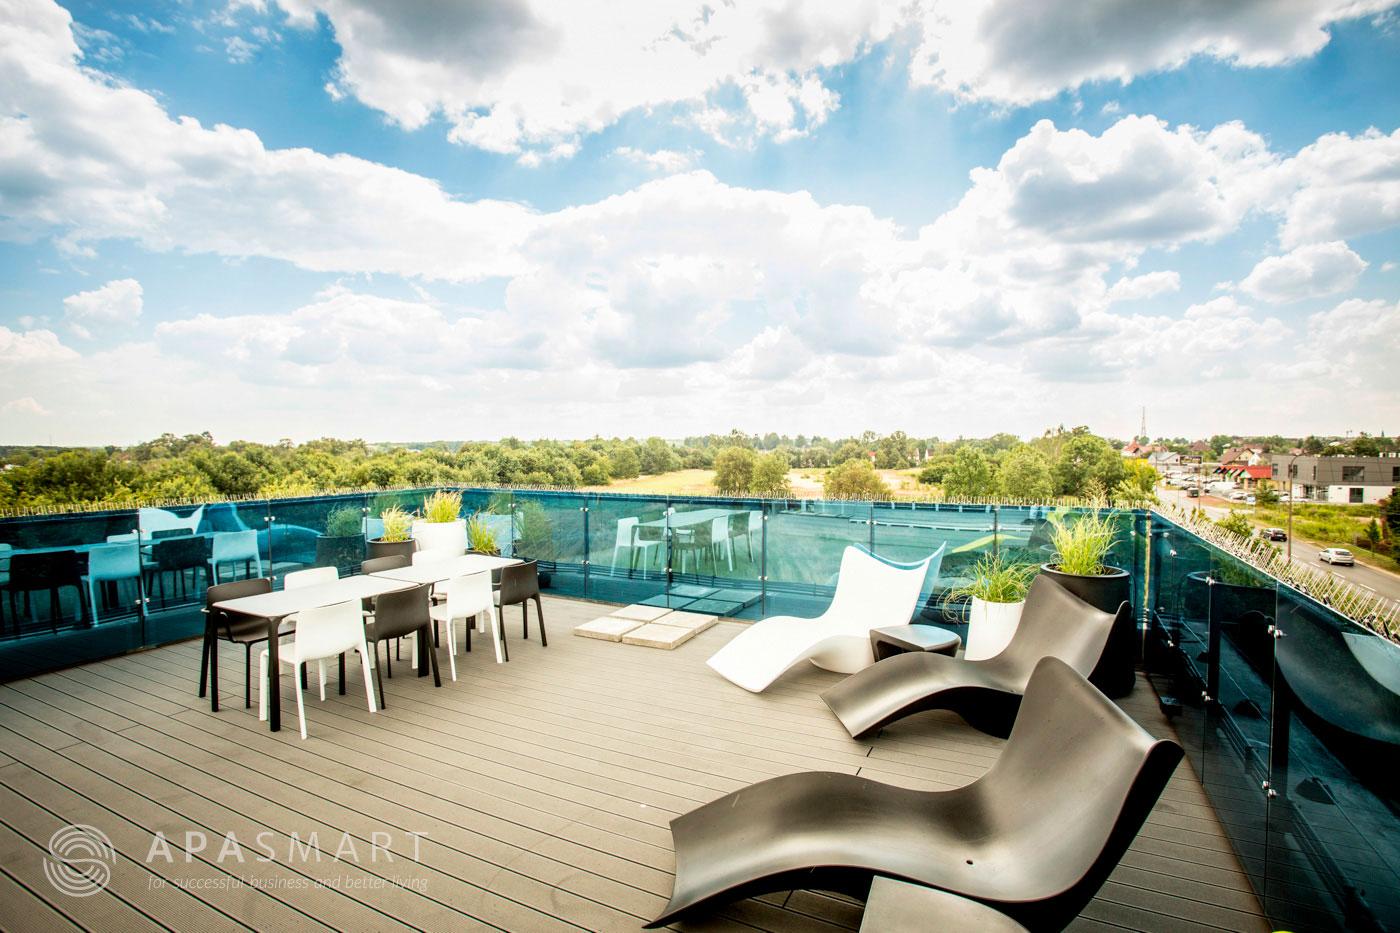 muebles-exterior-diseño-mobiliario-moderno-vanguardista-terraza-smart-house-vondom-3